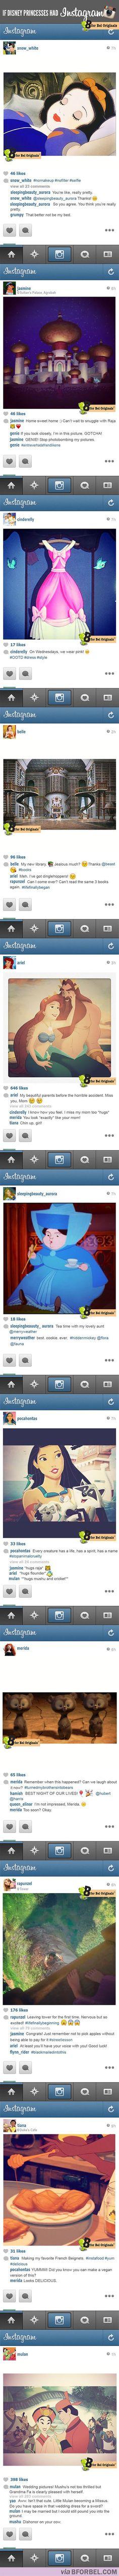 If Disney Princesses Were on Instagram [Pics]